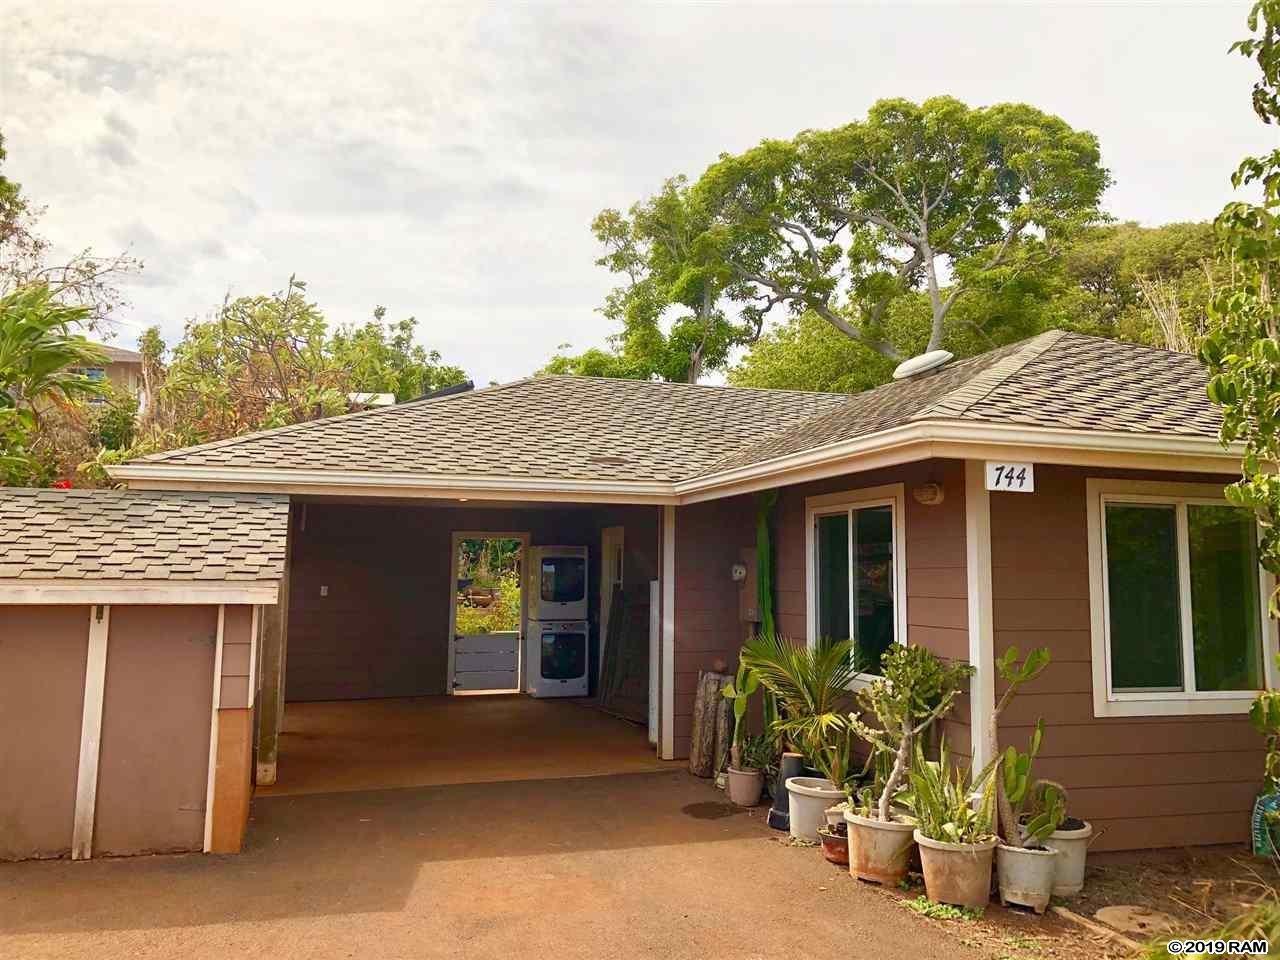 744 Hana Hwy, Spreckelsville Paia Kuau